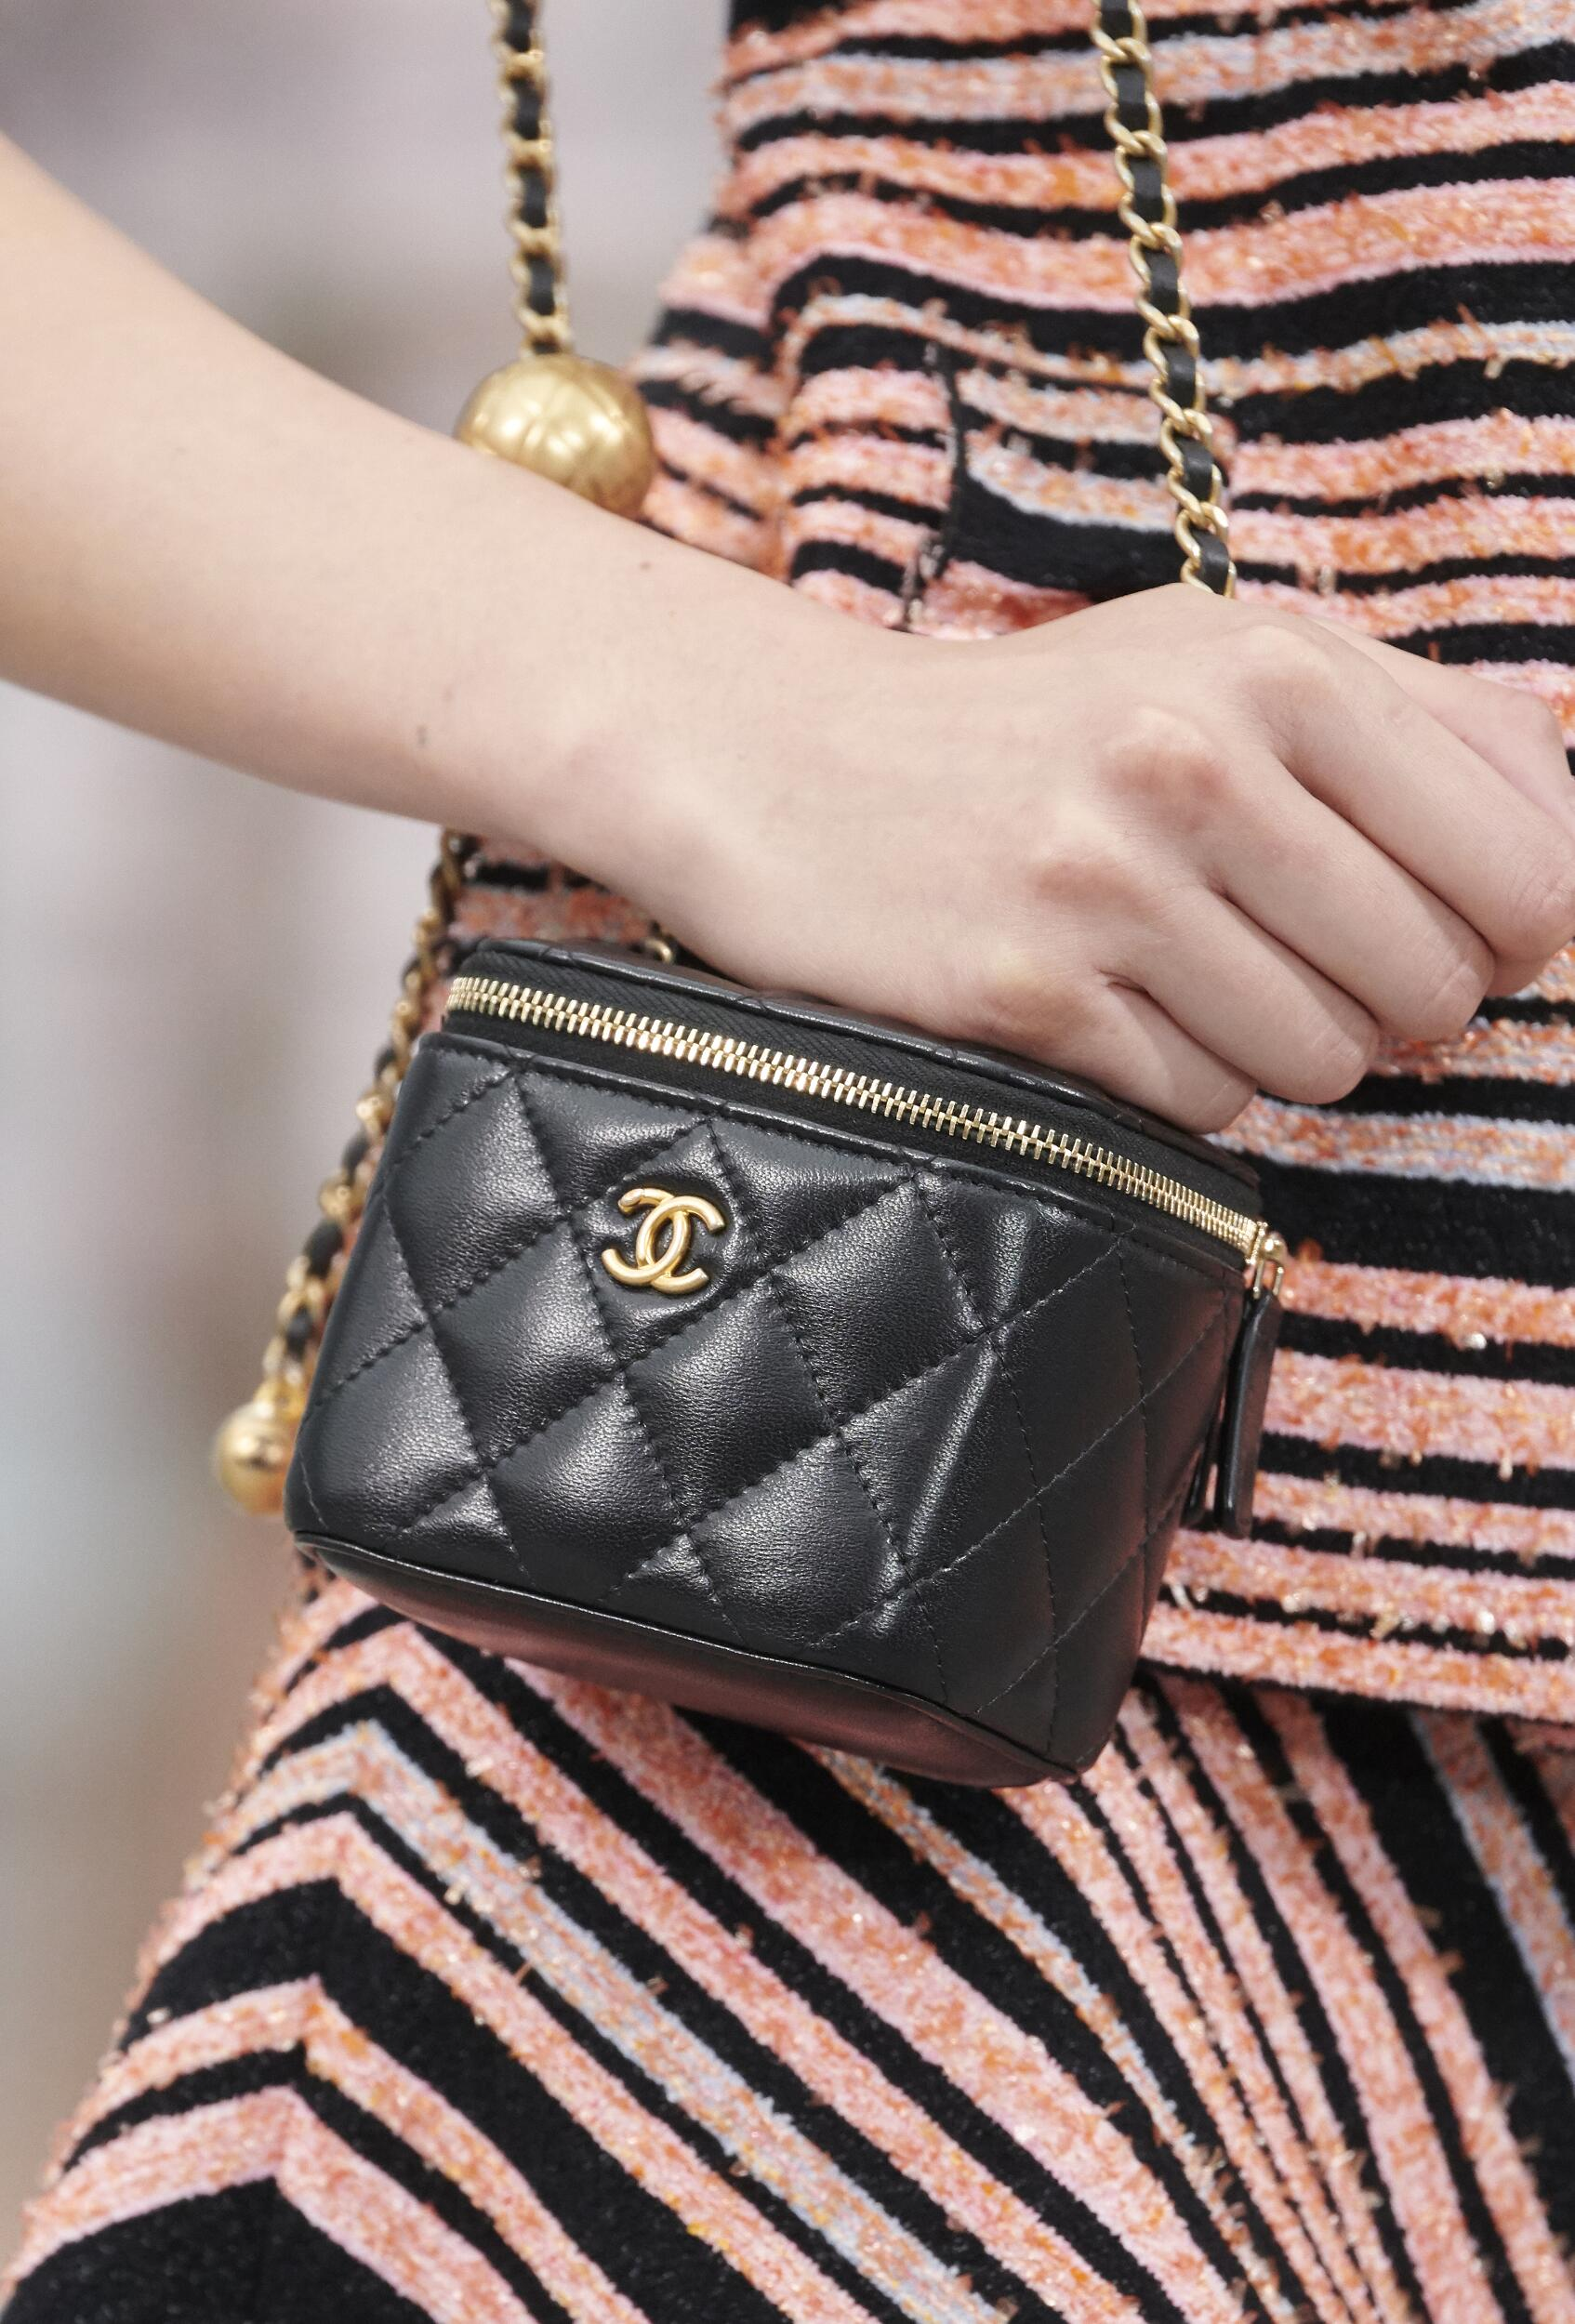 Chanel Spring 2020 Bag